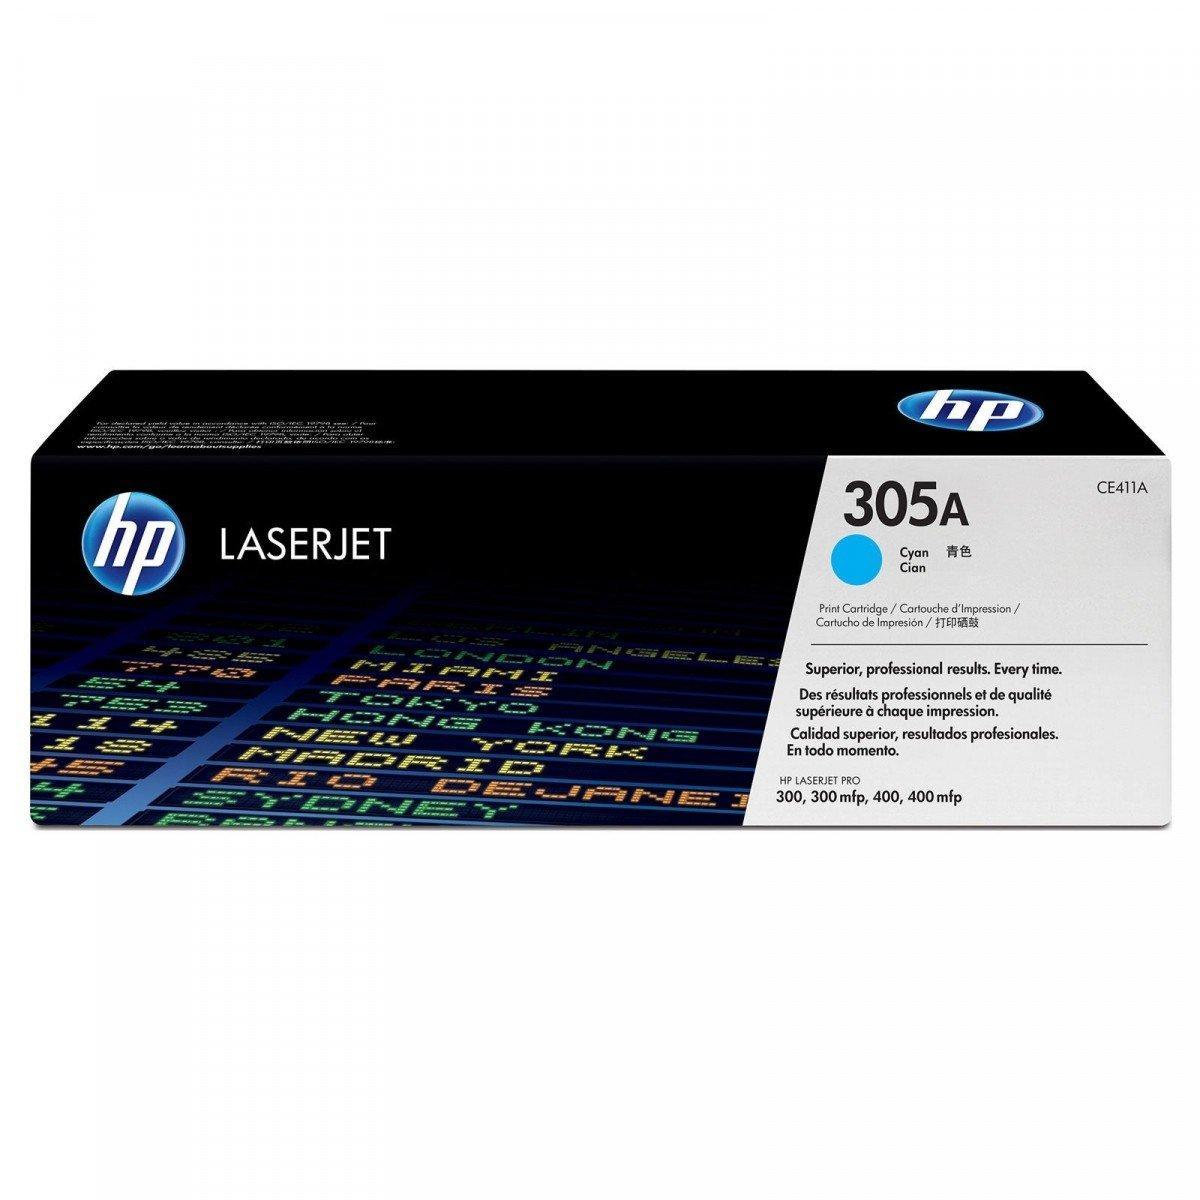 Заправка картриджа HP CE411A (305A) синий